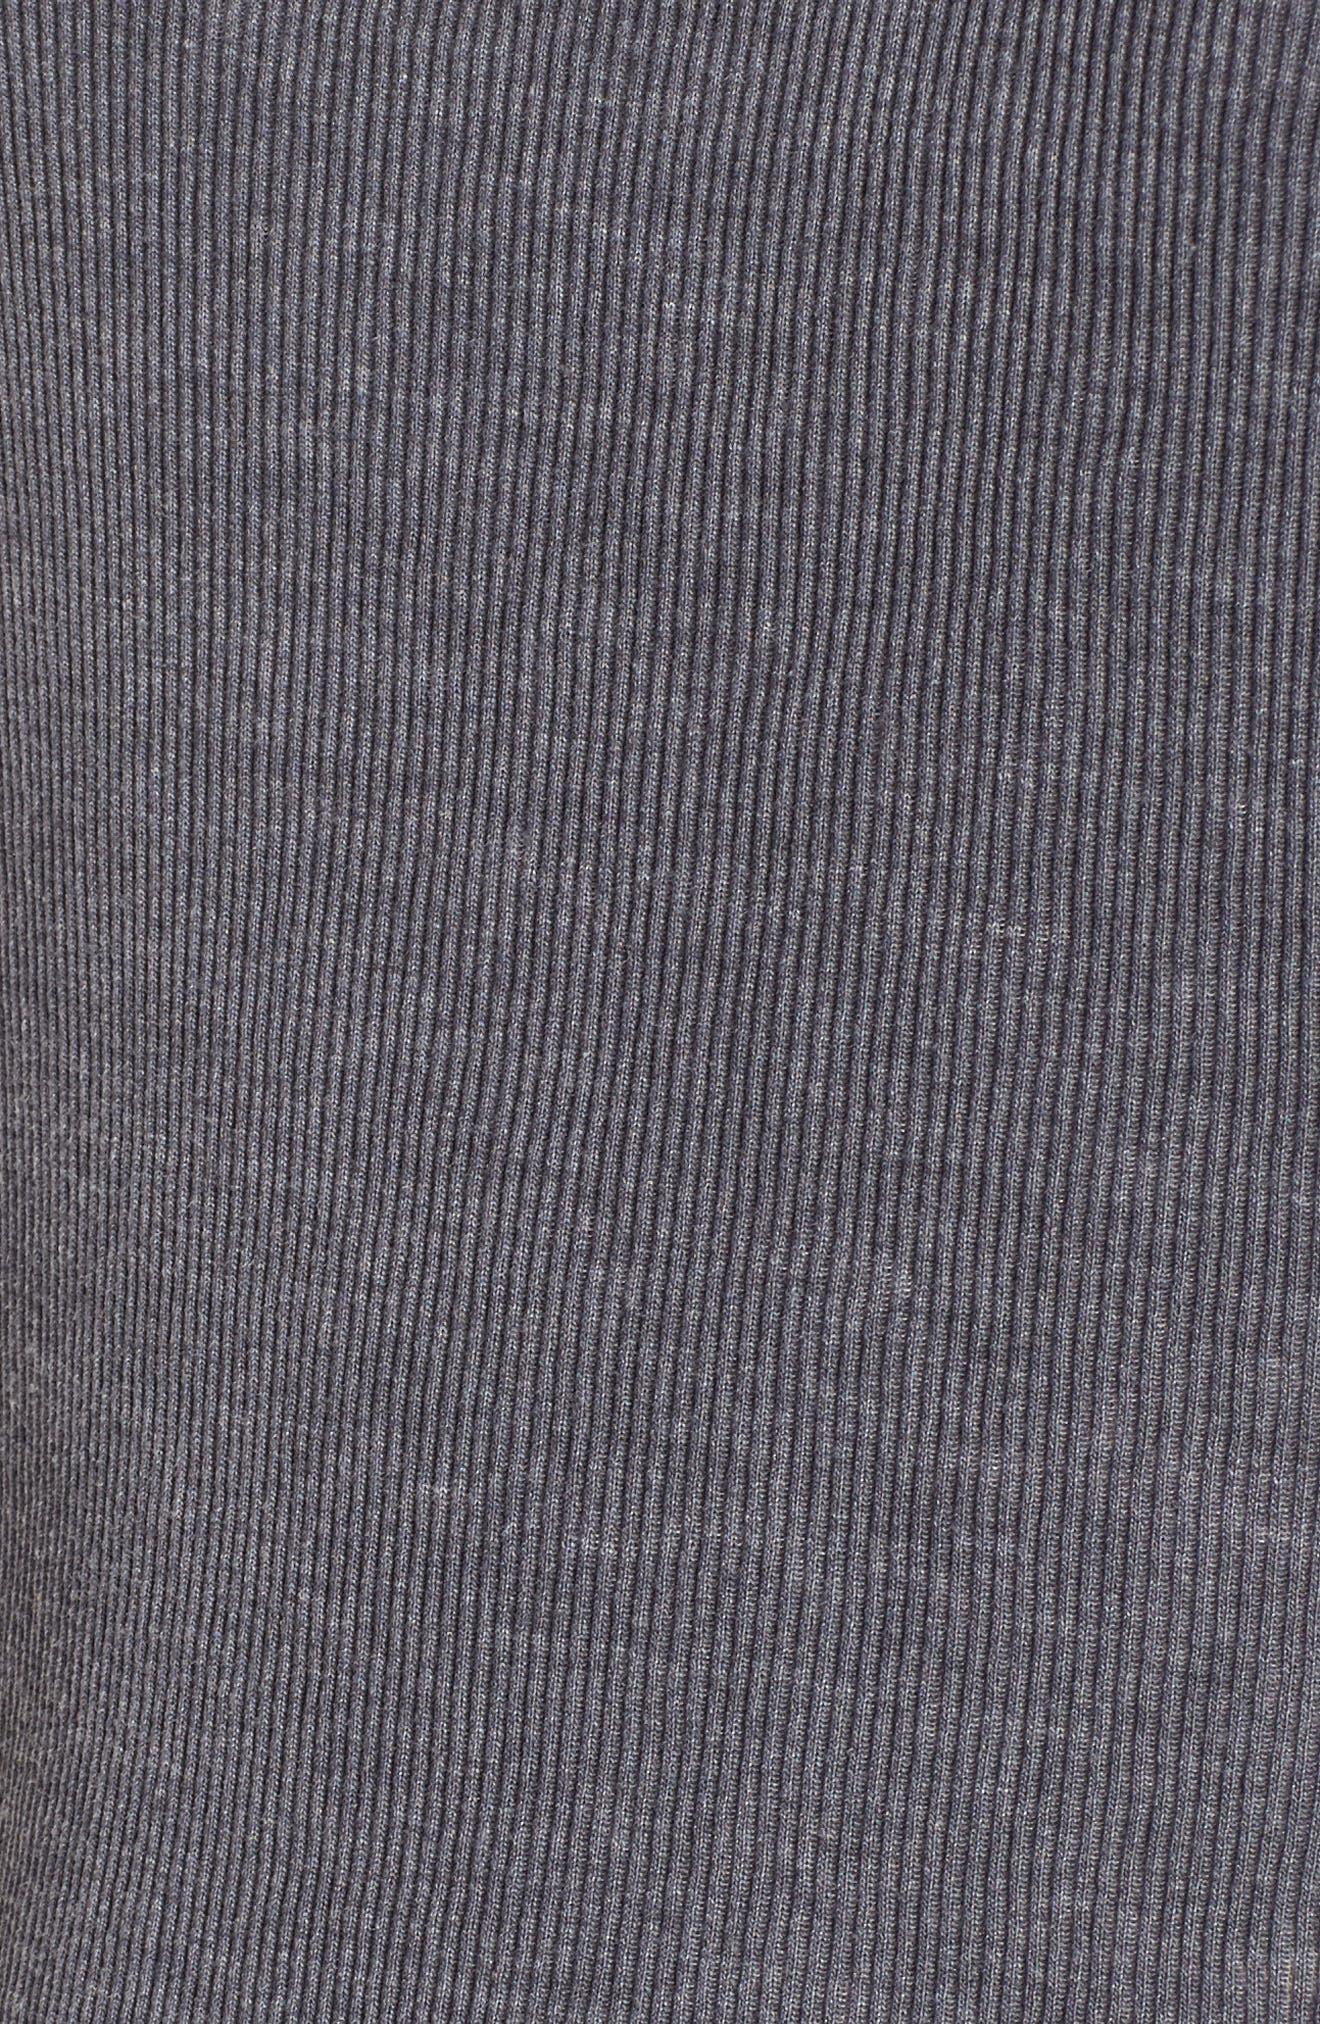 Mixed Knit Tank,                             Alternate thumbnail 5, color,                             Grey Cloudburst